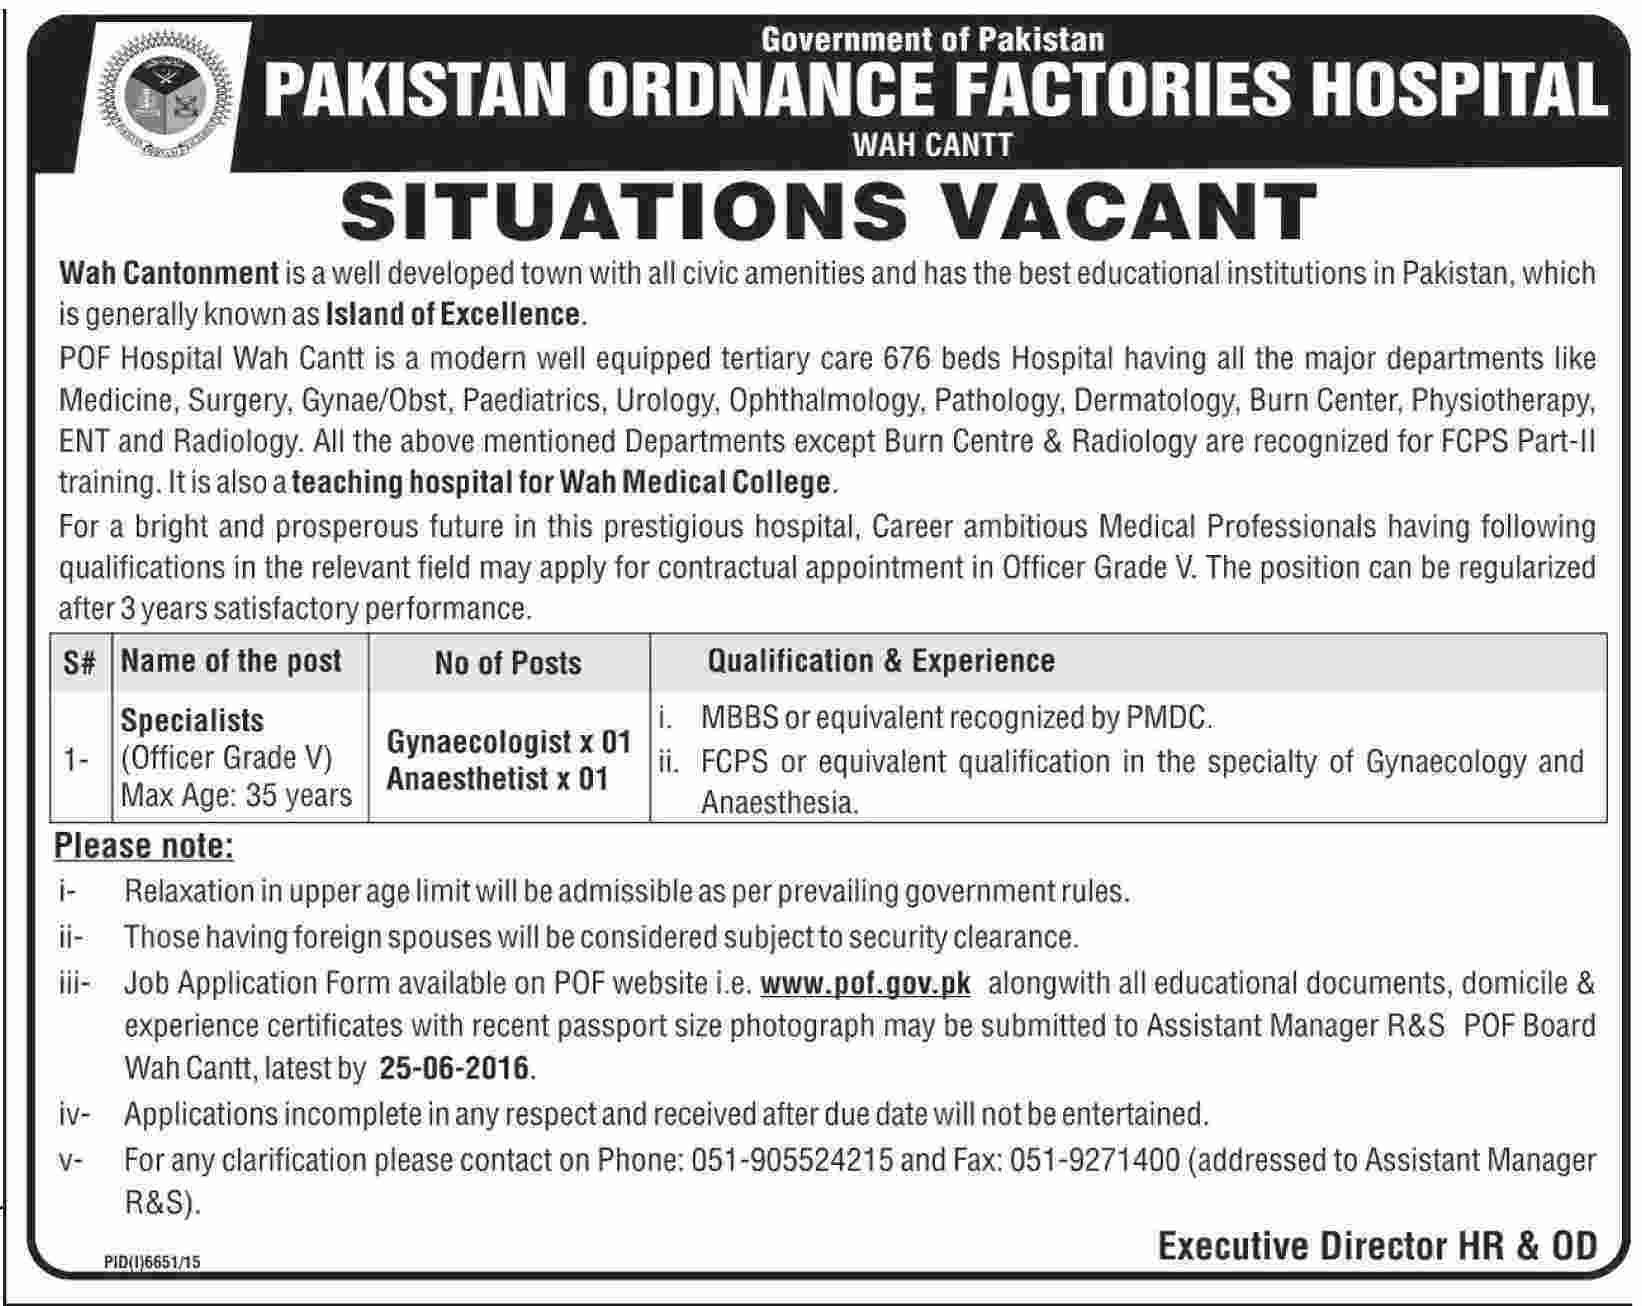 Pakistan Ordanance Factories Hospital